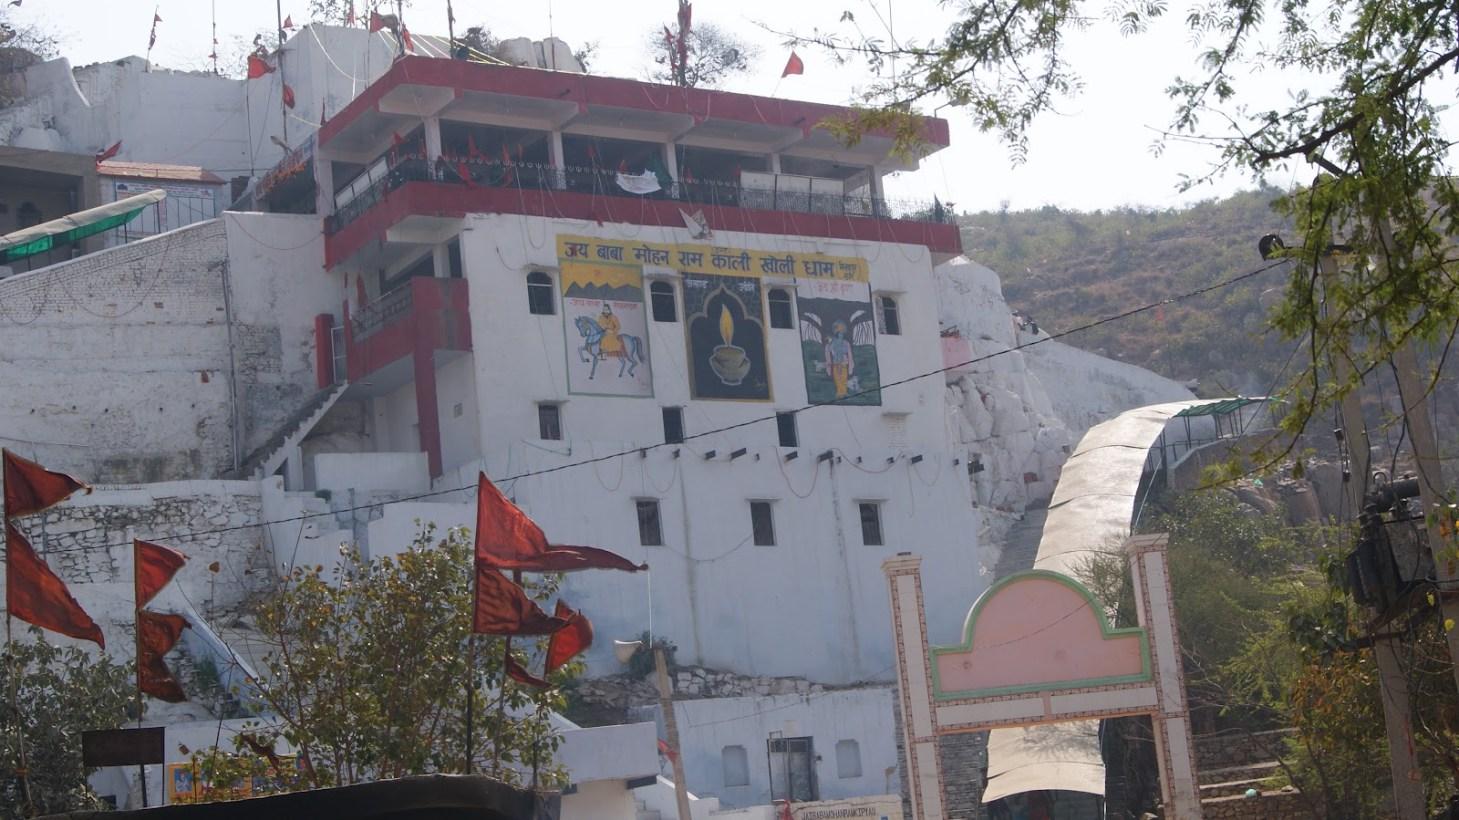 Bhiwadi Baba Mohan Ram - History, Timings, Accommodations, Puja